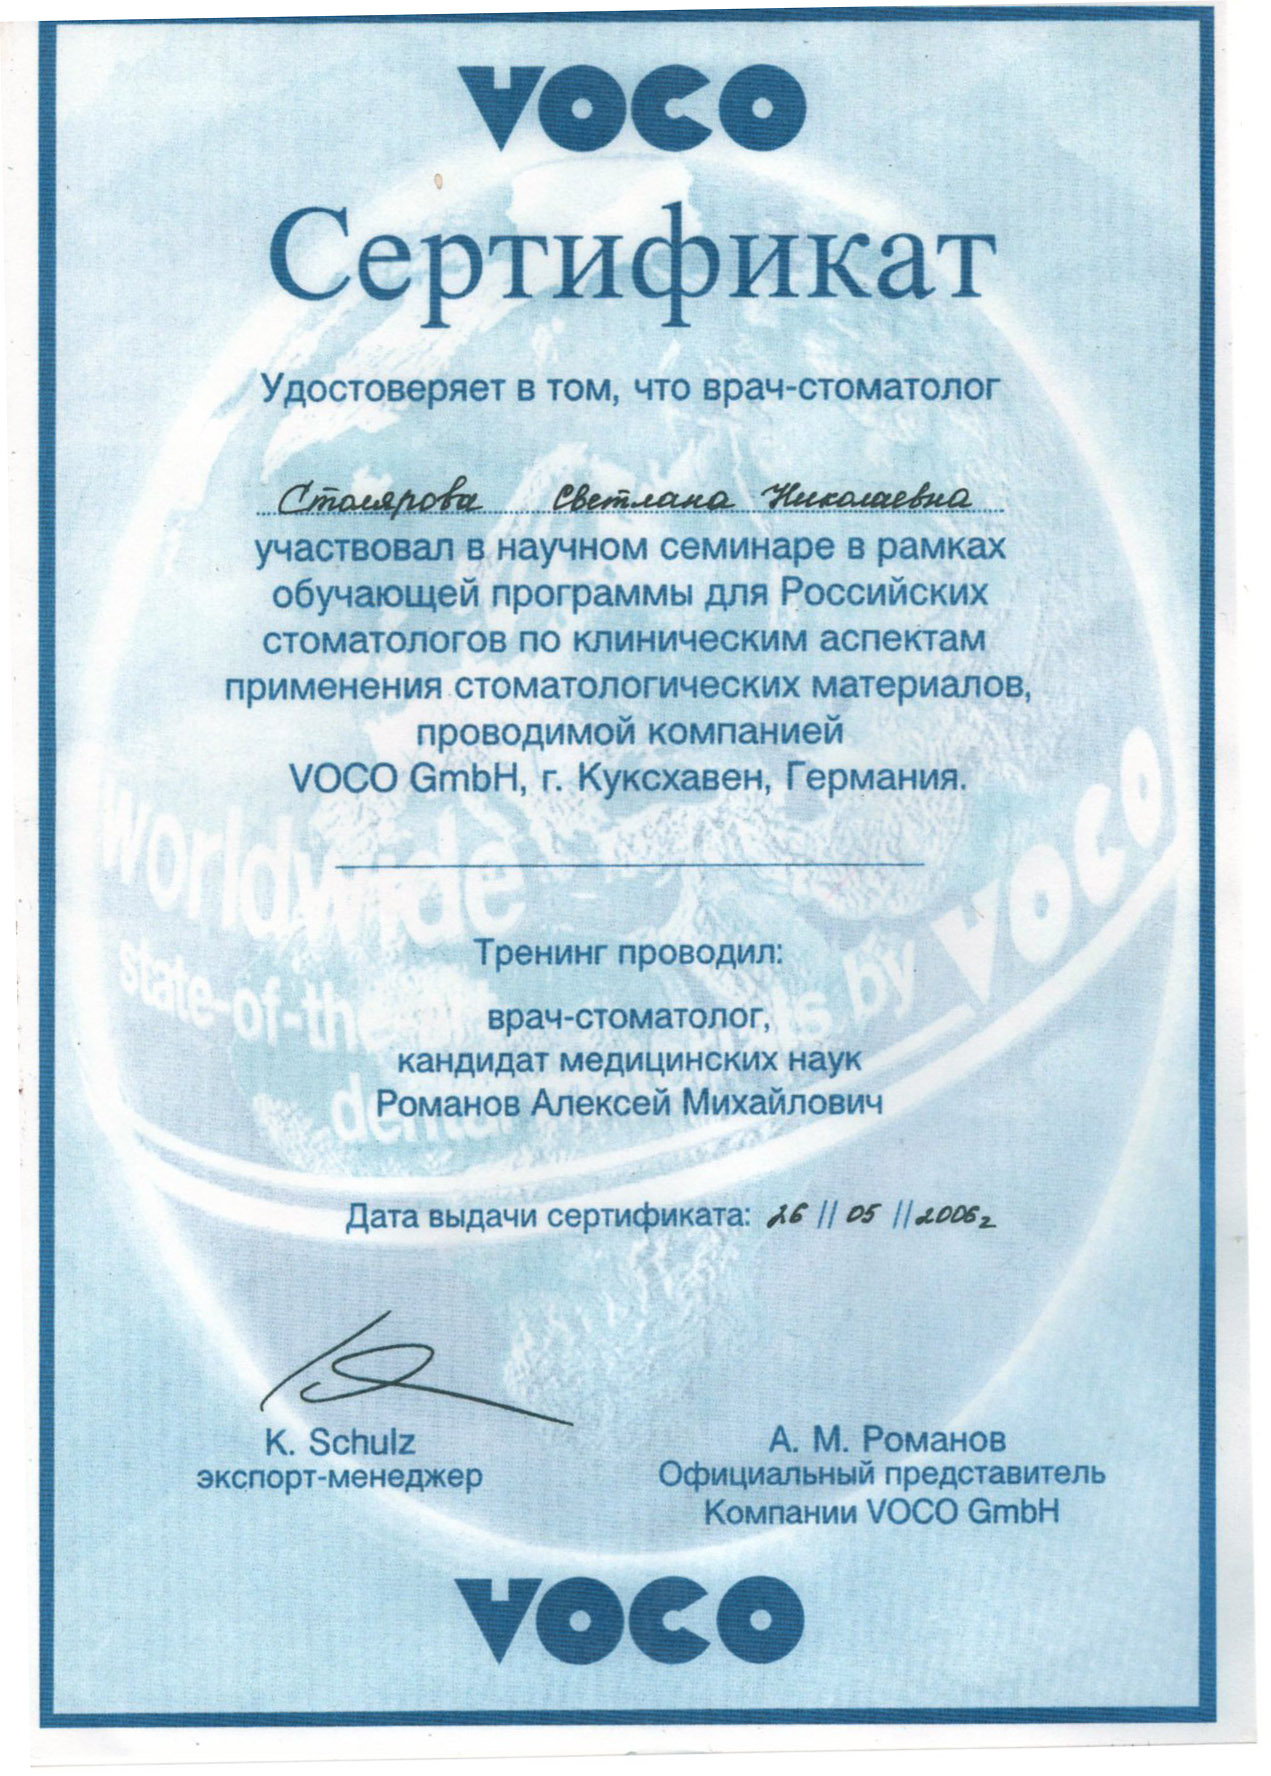 Столярова Светлана Николаевна - Сертификат_07